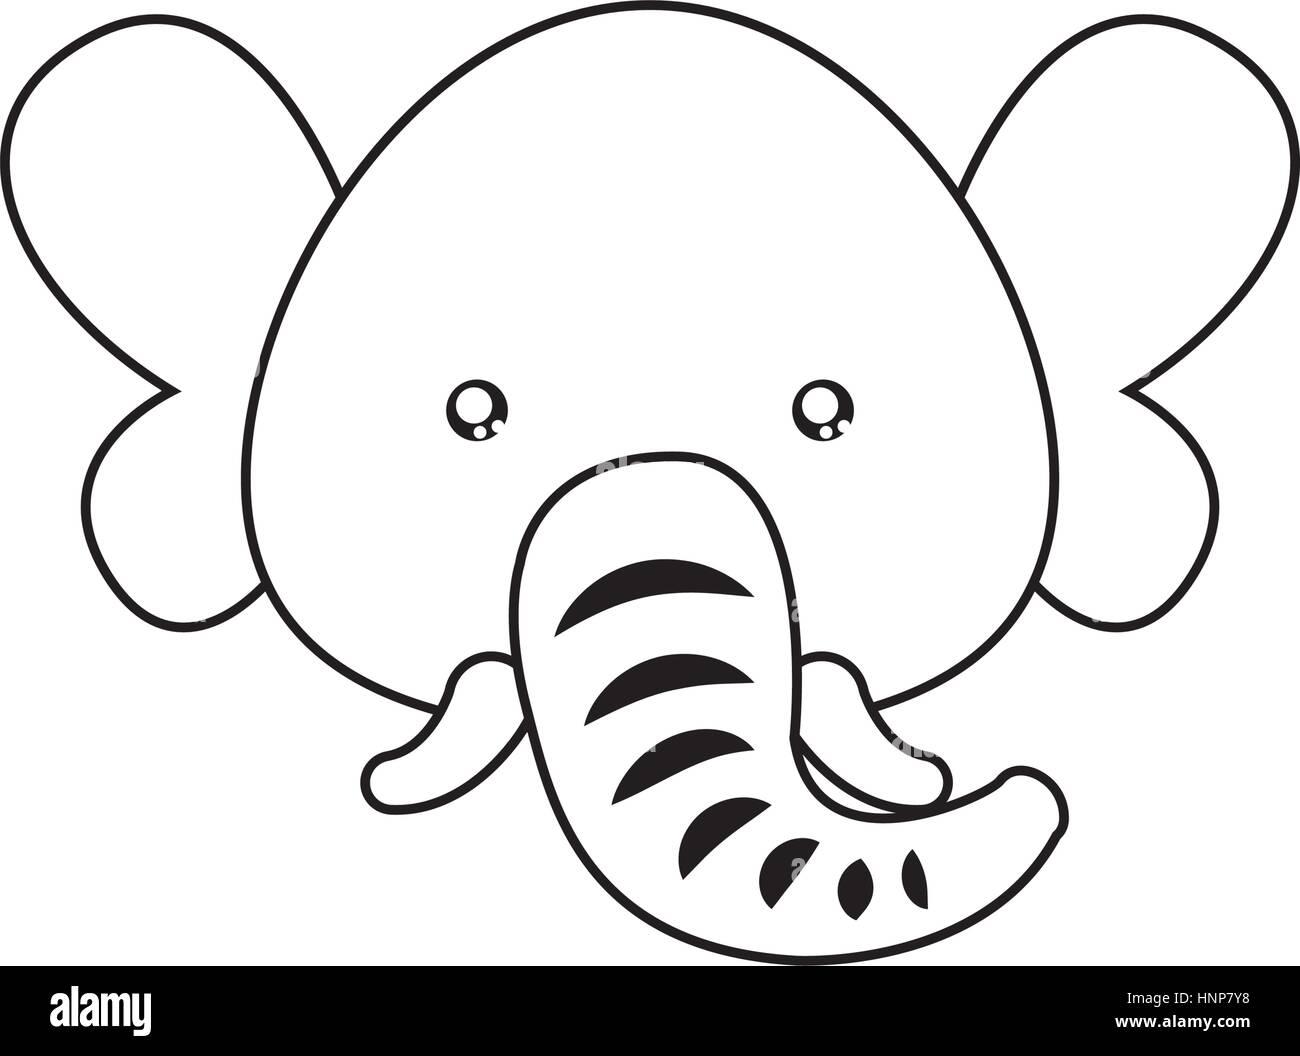 Elephant Drawing Face Stock Vector Art Illustration